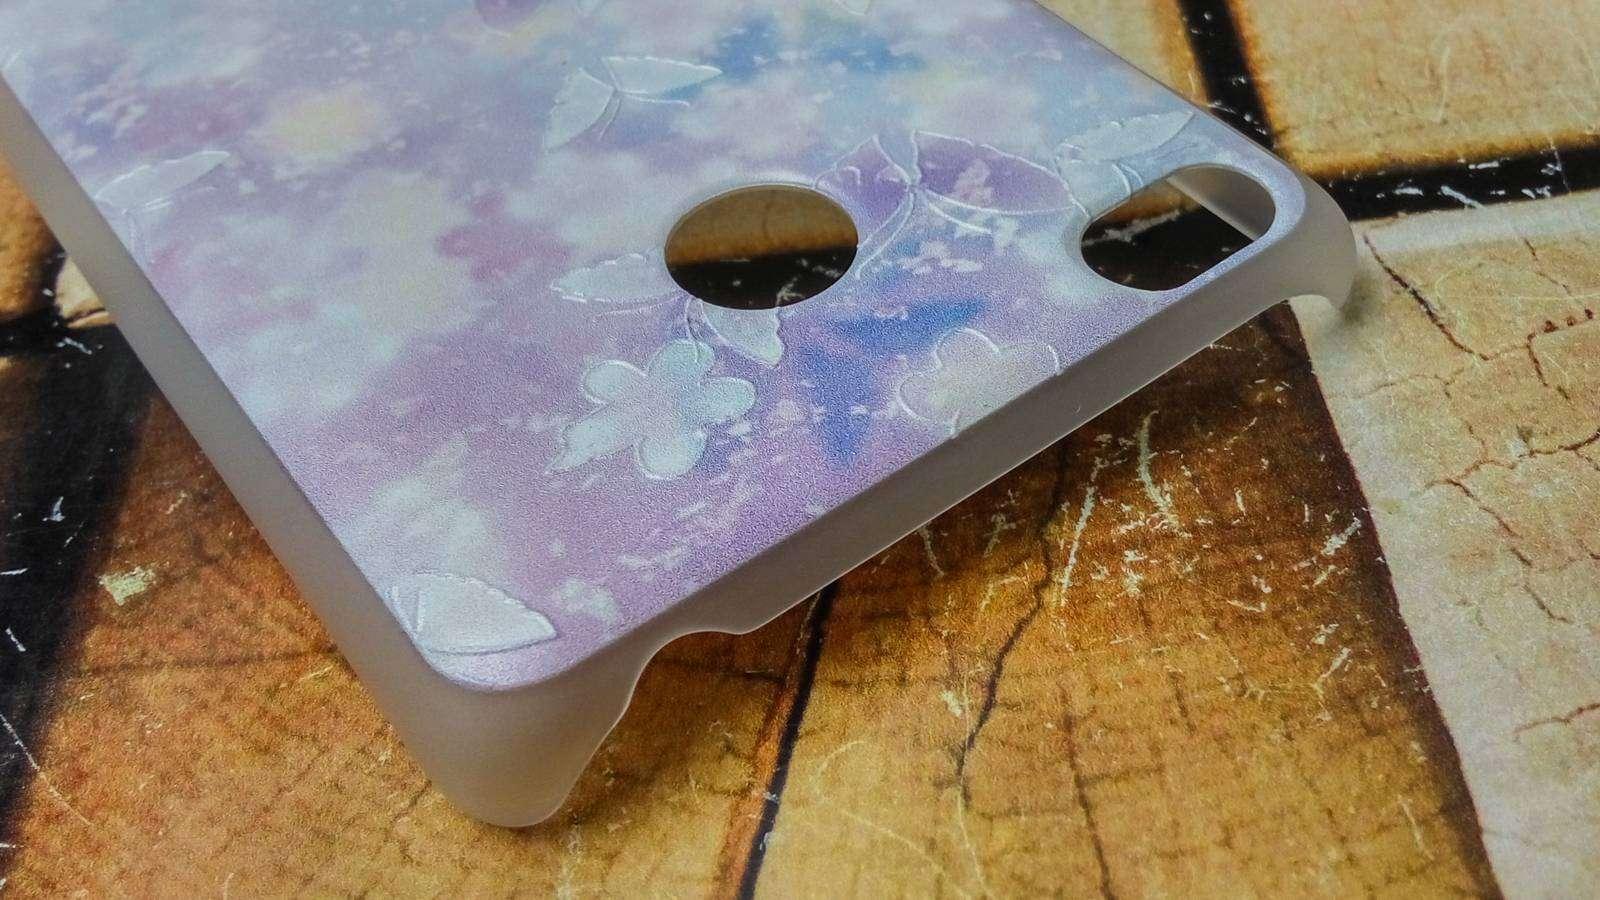 Aliexpress: Красивый женский чехол для Xiaomi Redmi 3 Pro и Redmi 3 S